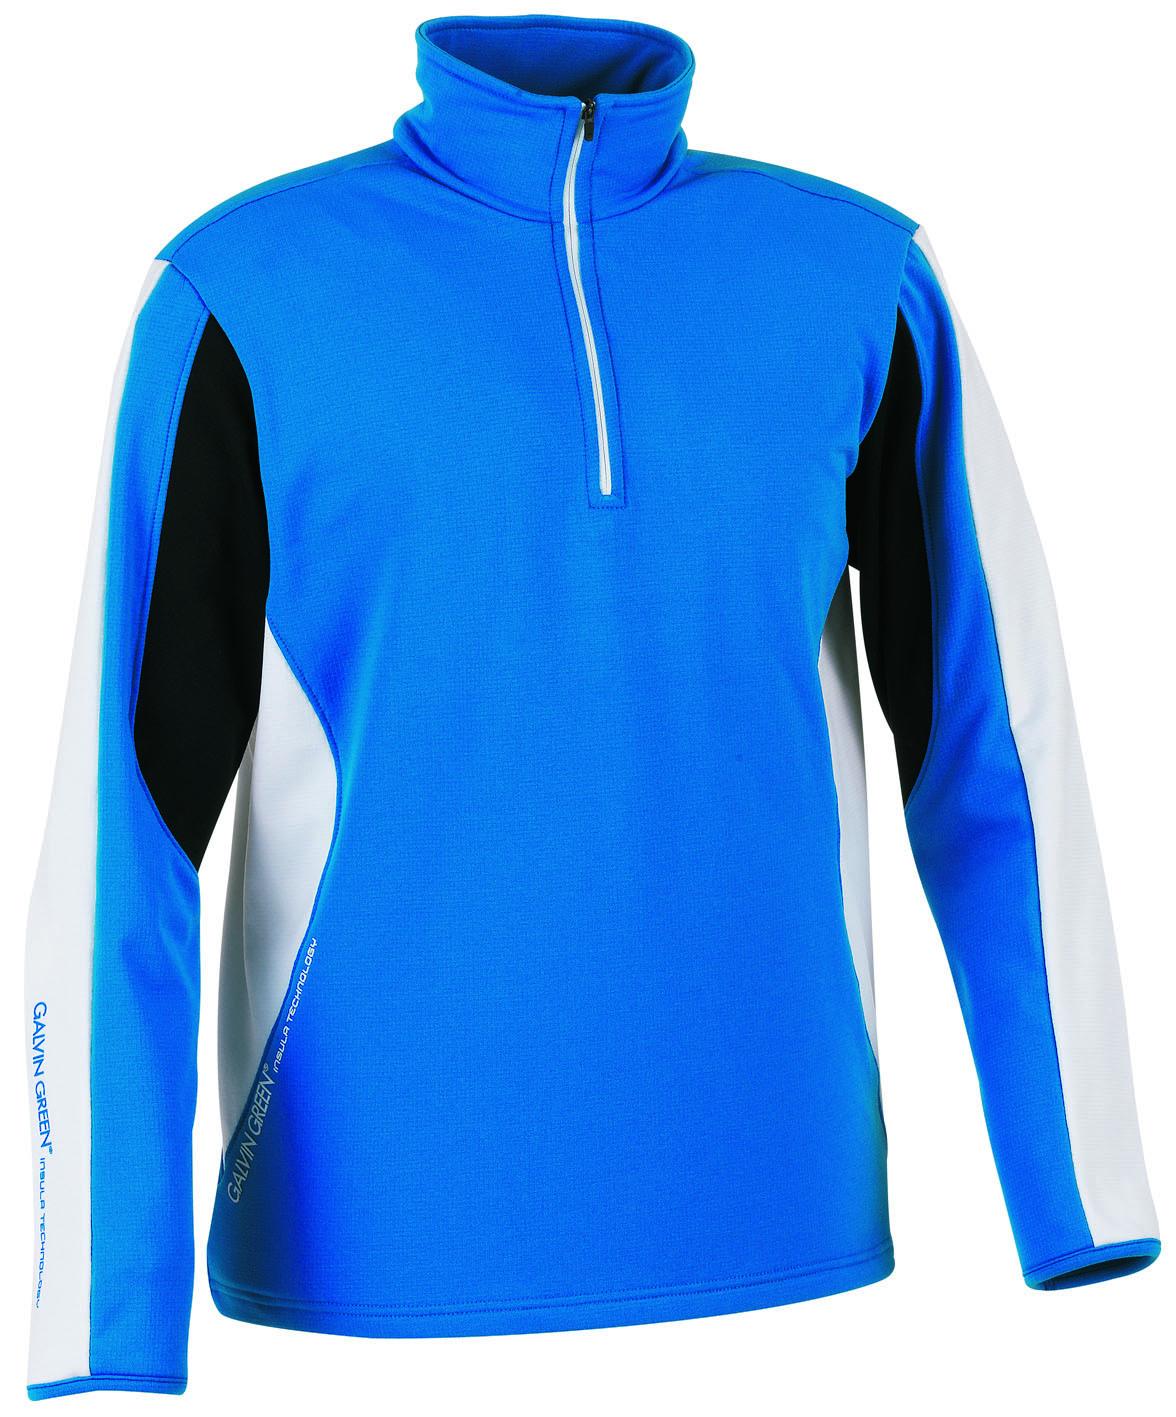 Dex pullover in blue